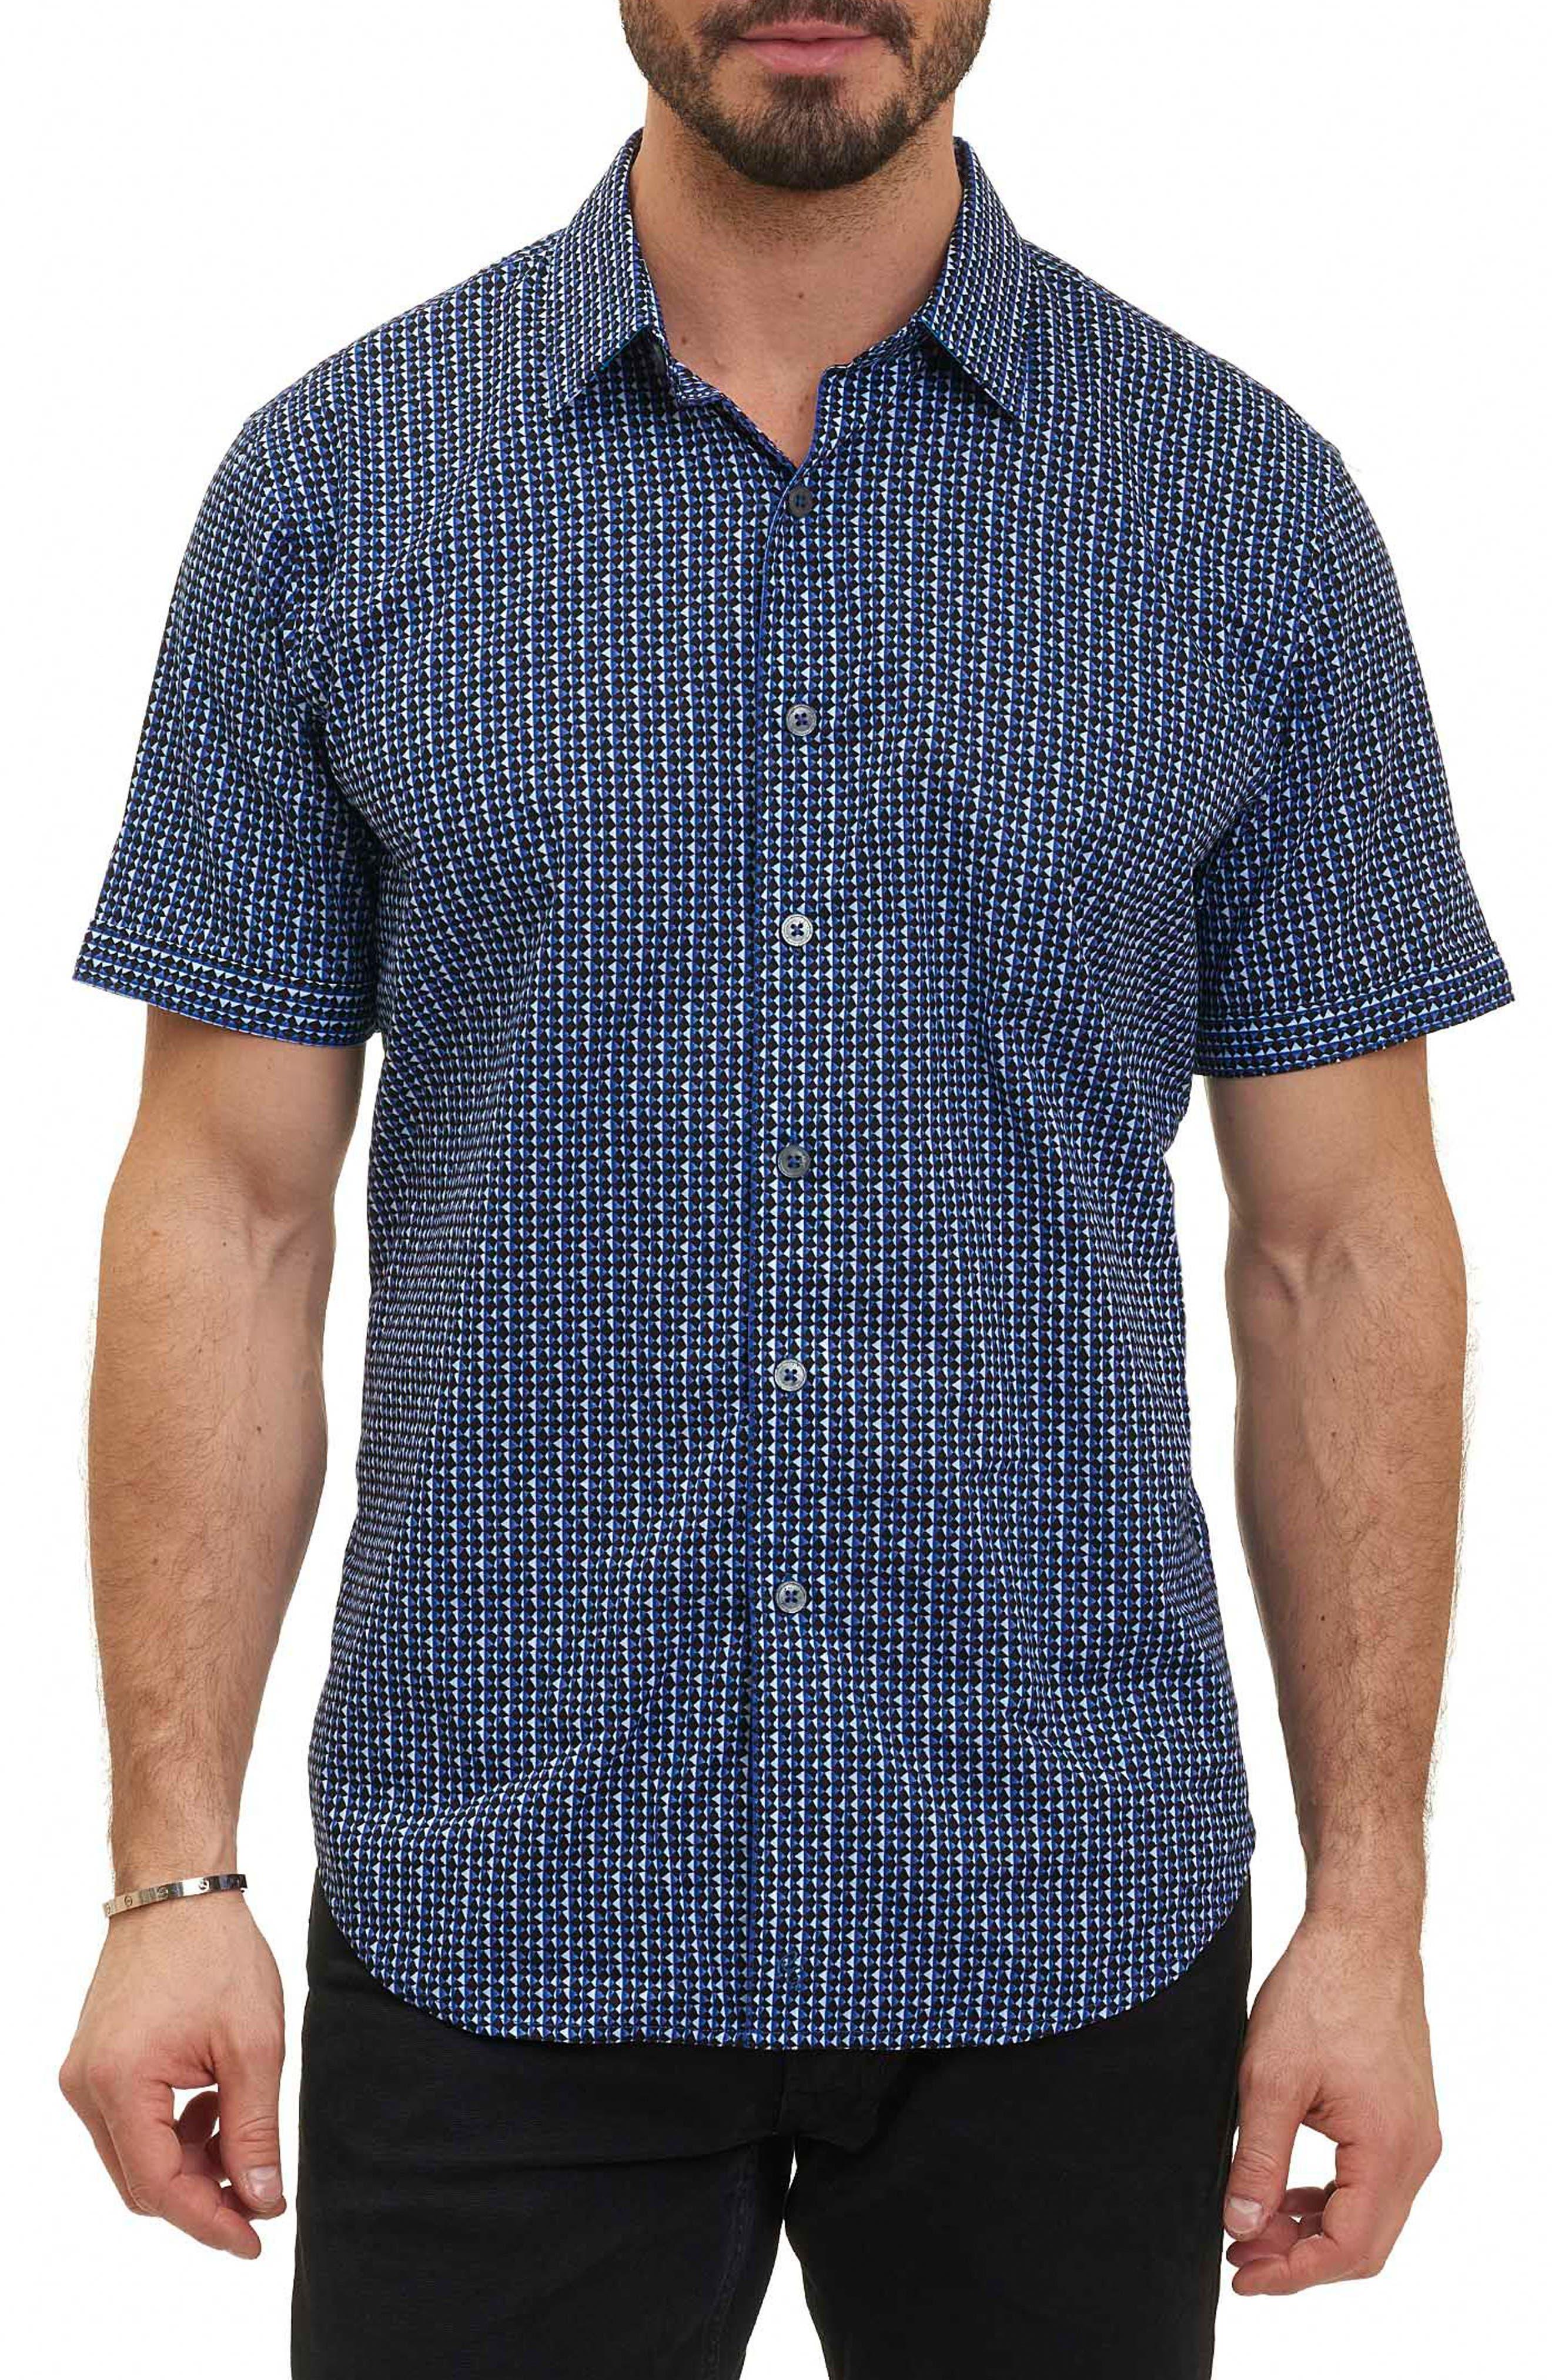 Main Image - Robert Graham Gardena Classic Fit Geo Print Short Sleeve Sport Shirt